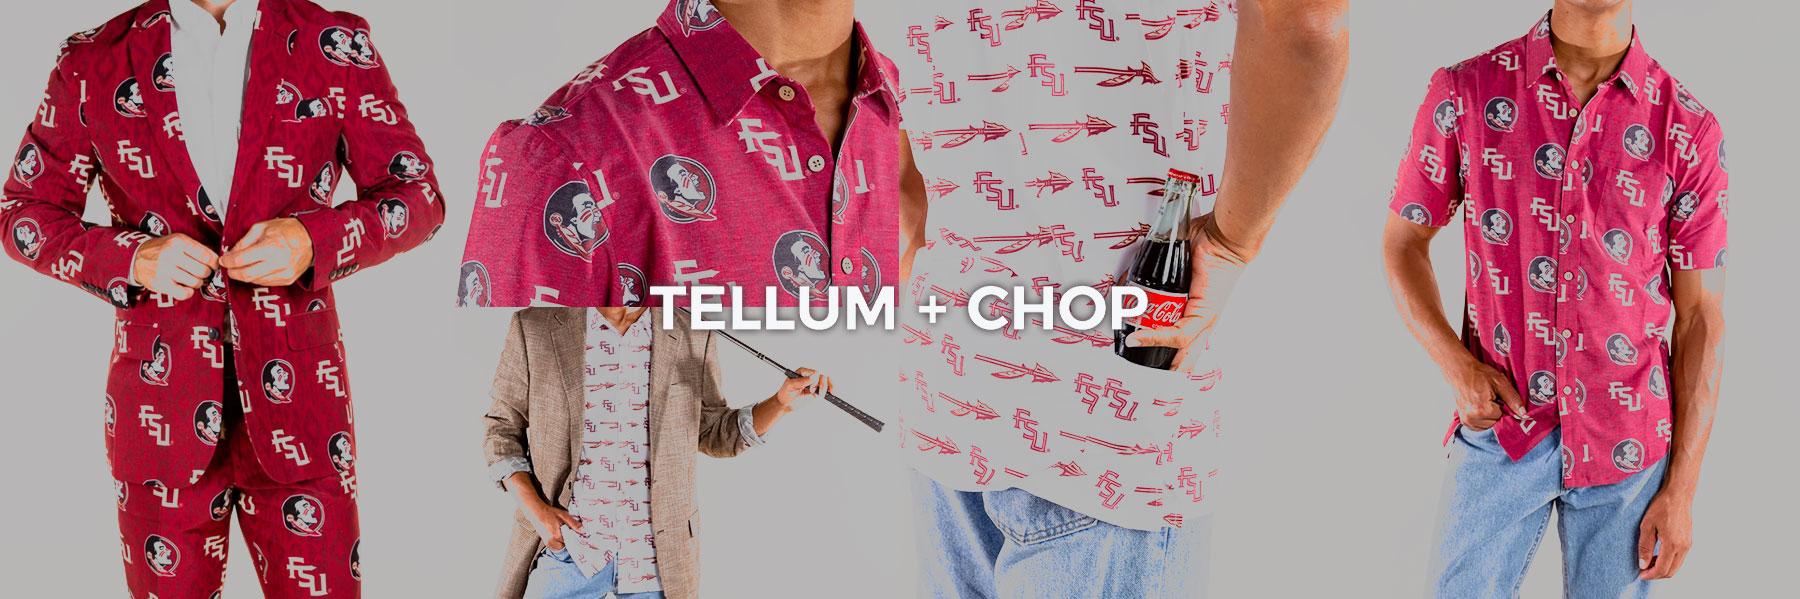 Tellum + Chop